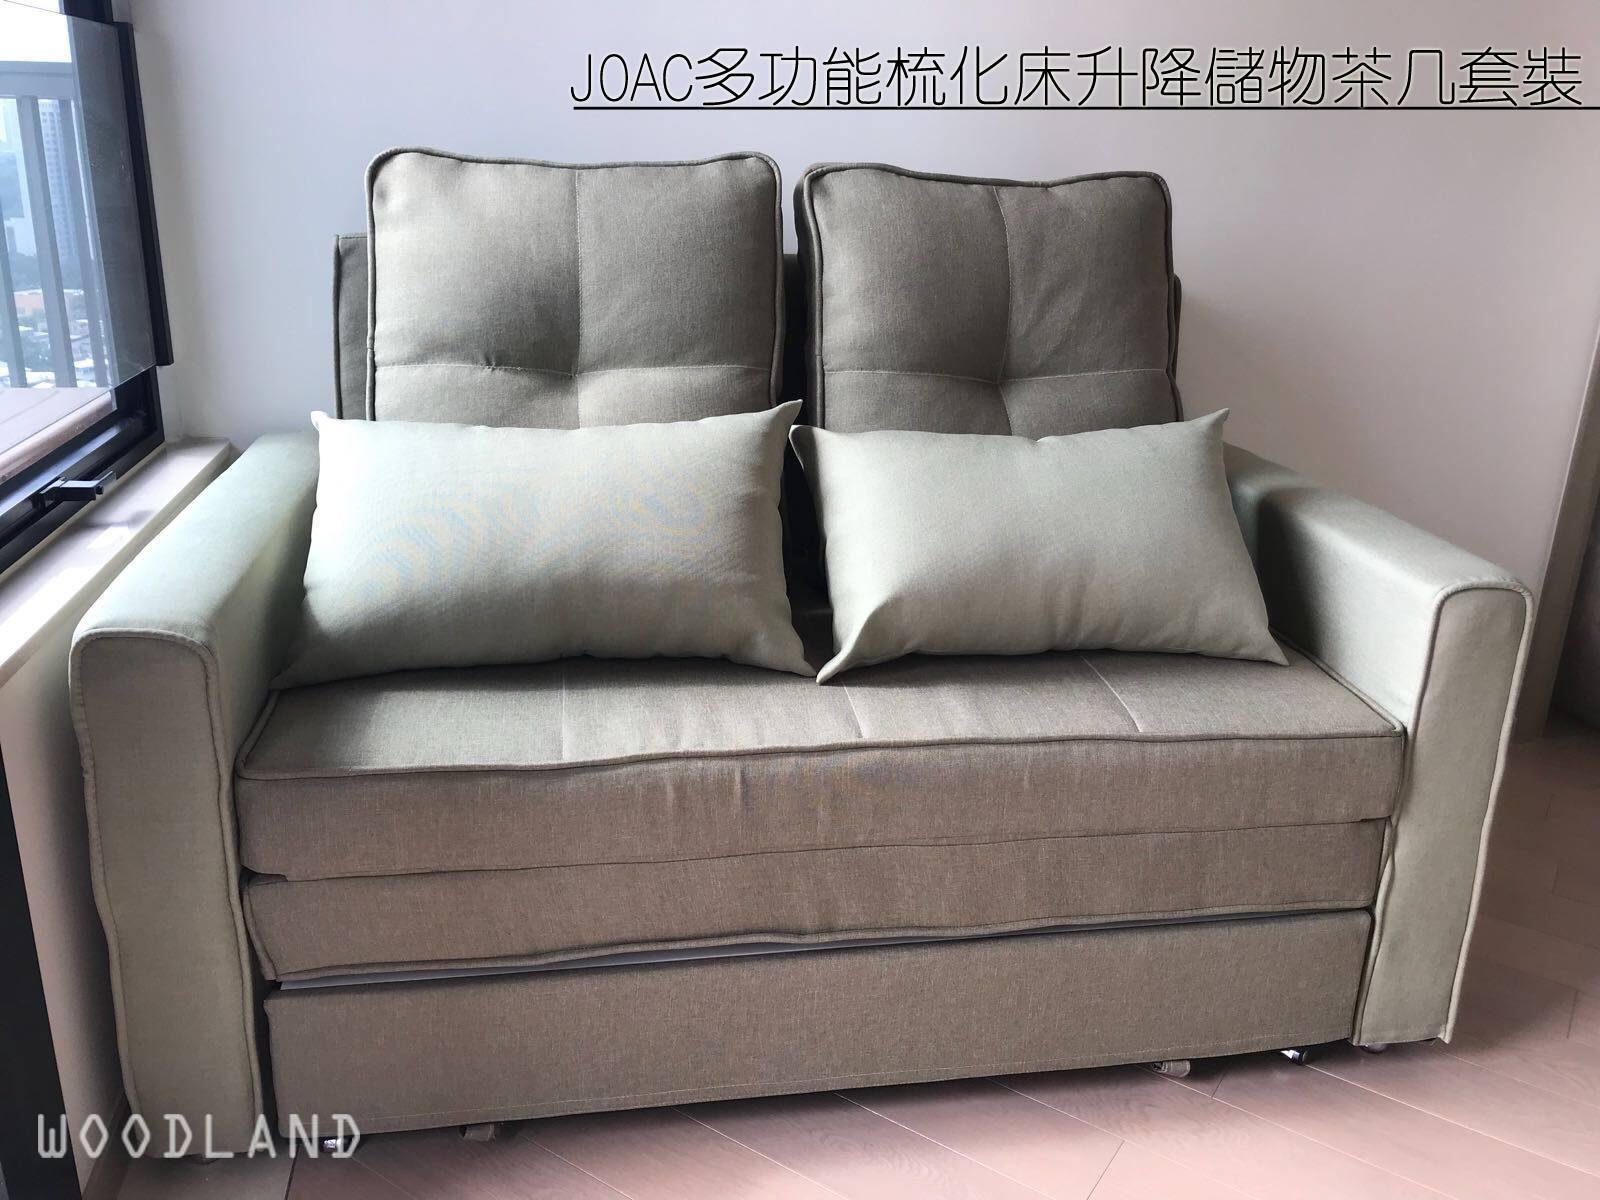 JOAC 多功能梳化床升降儲物茶几套裝 - 146CM